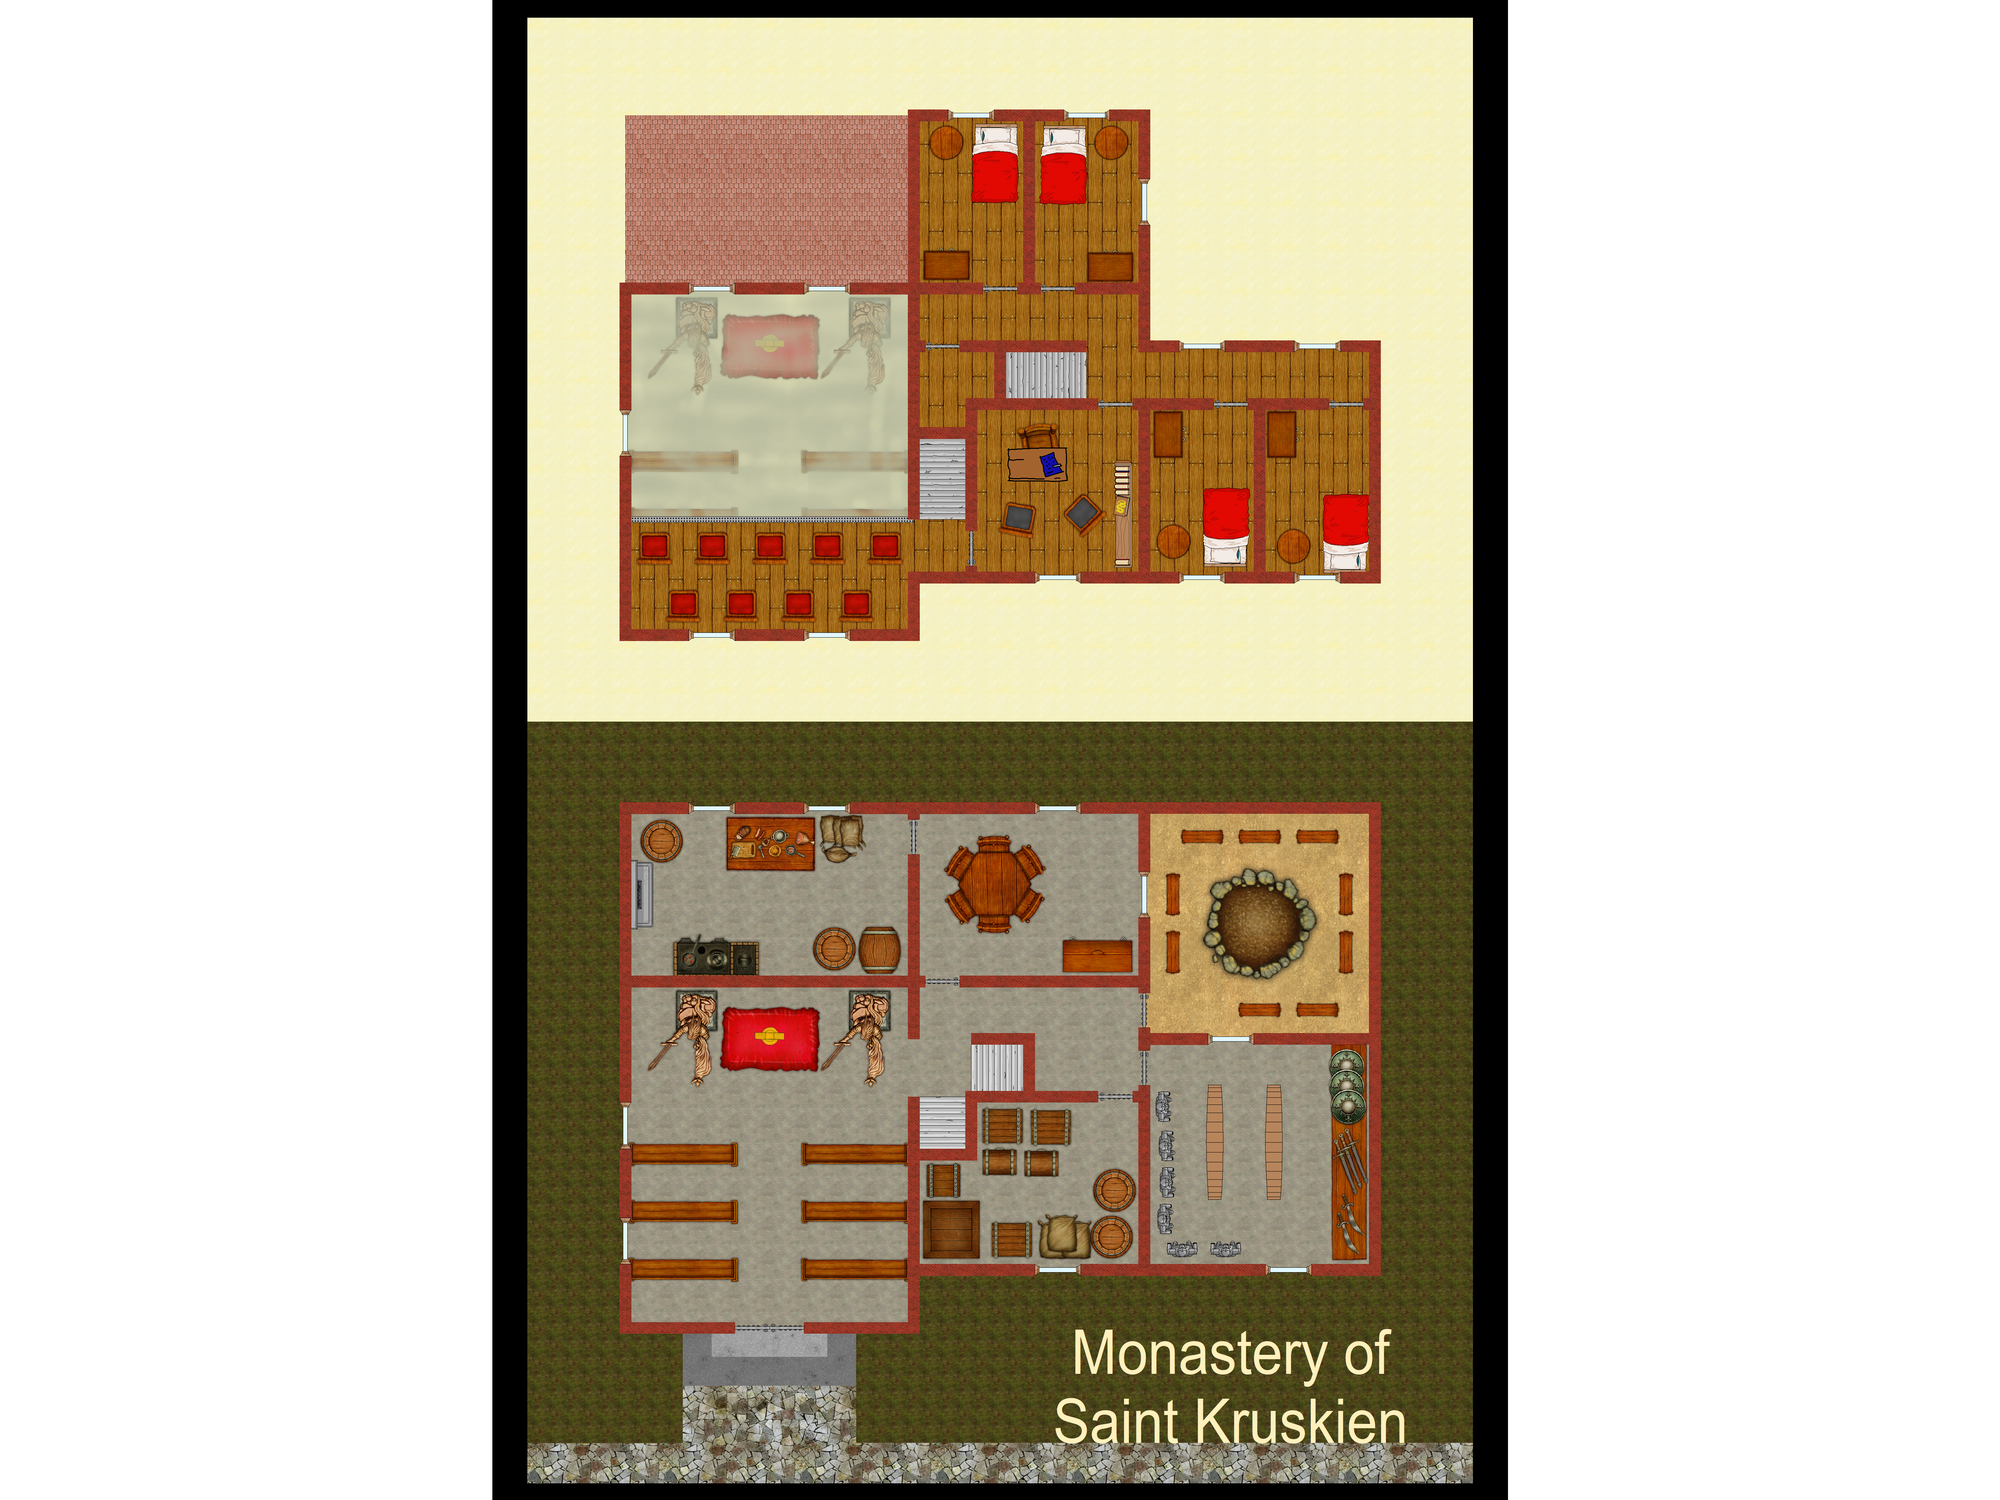 Heliogabalus_Old_Quarter_-_Monastery_of_Saint_Kruskien.PNG